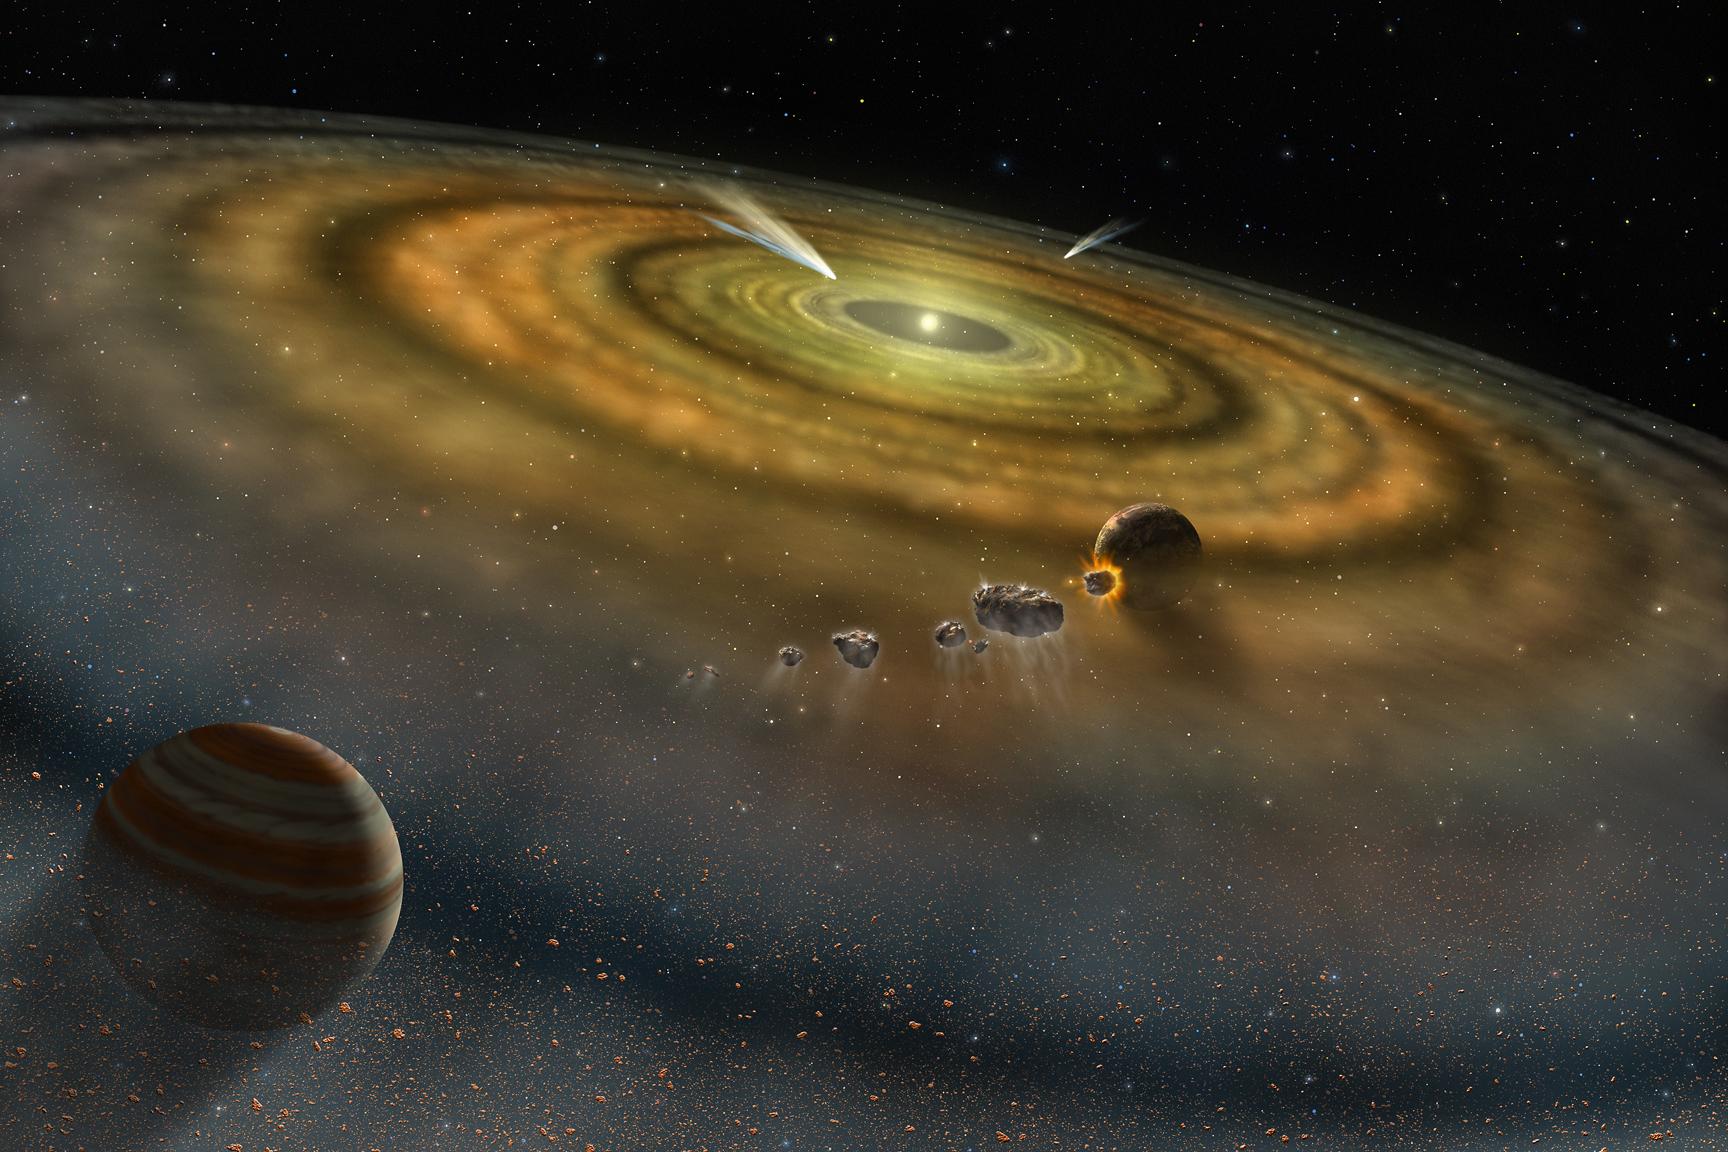 Alien Comet Cloud Spotted Around Faraway Star